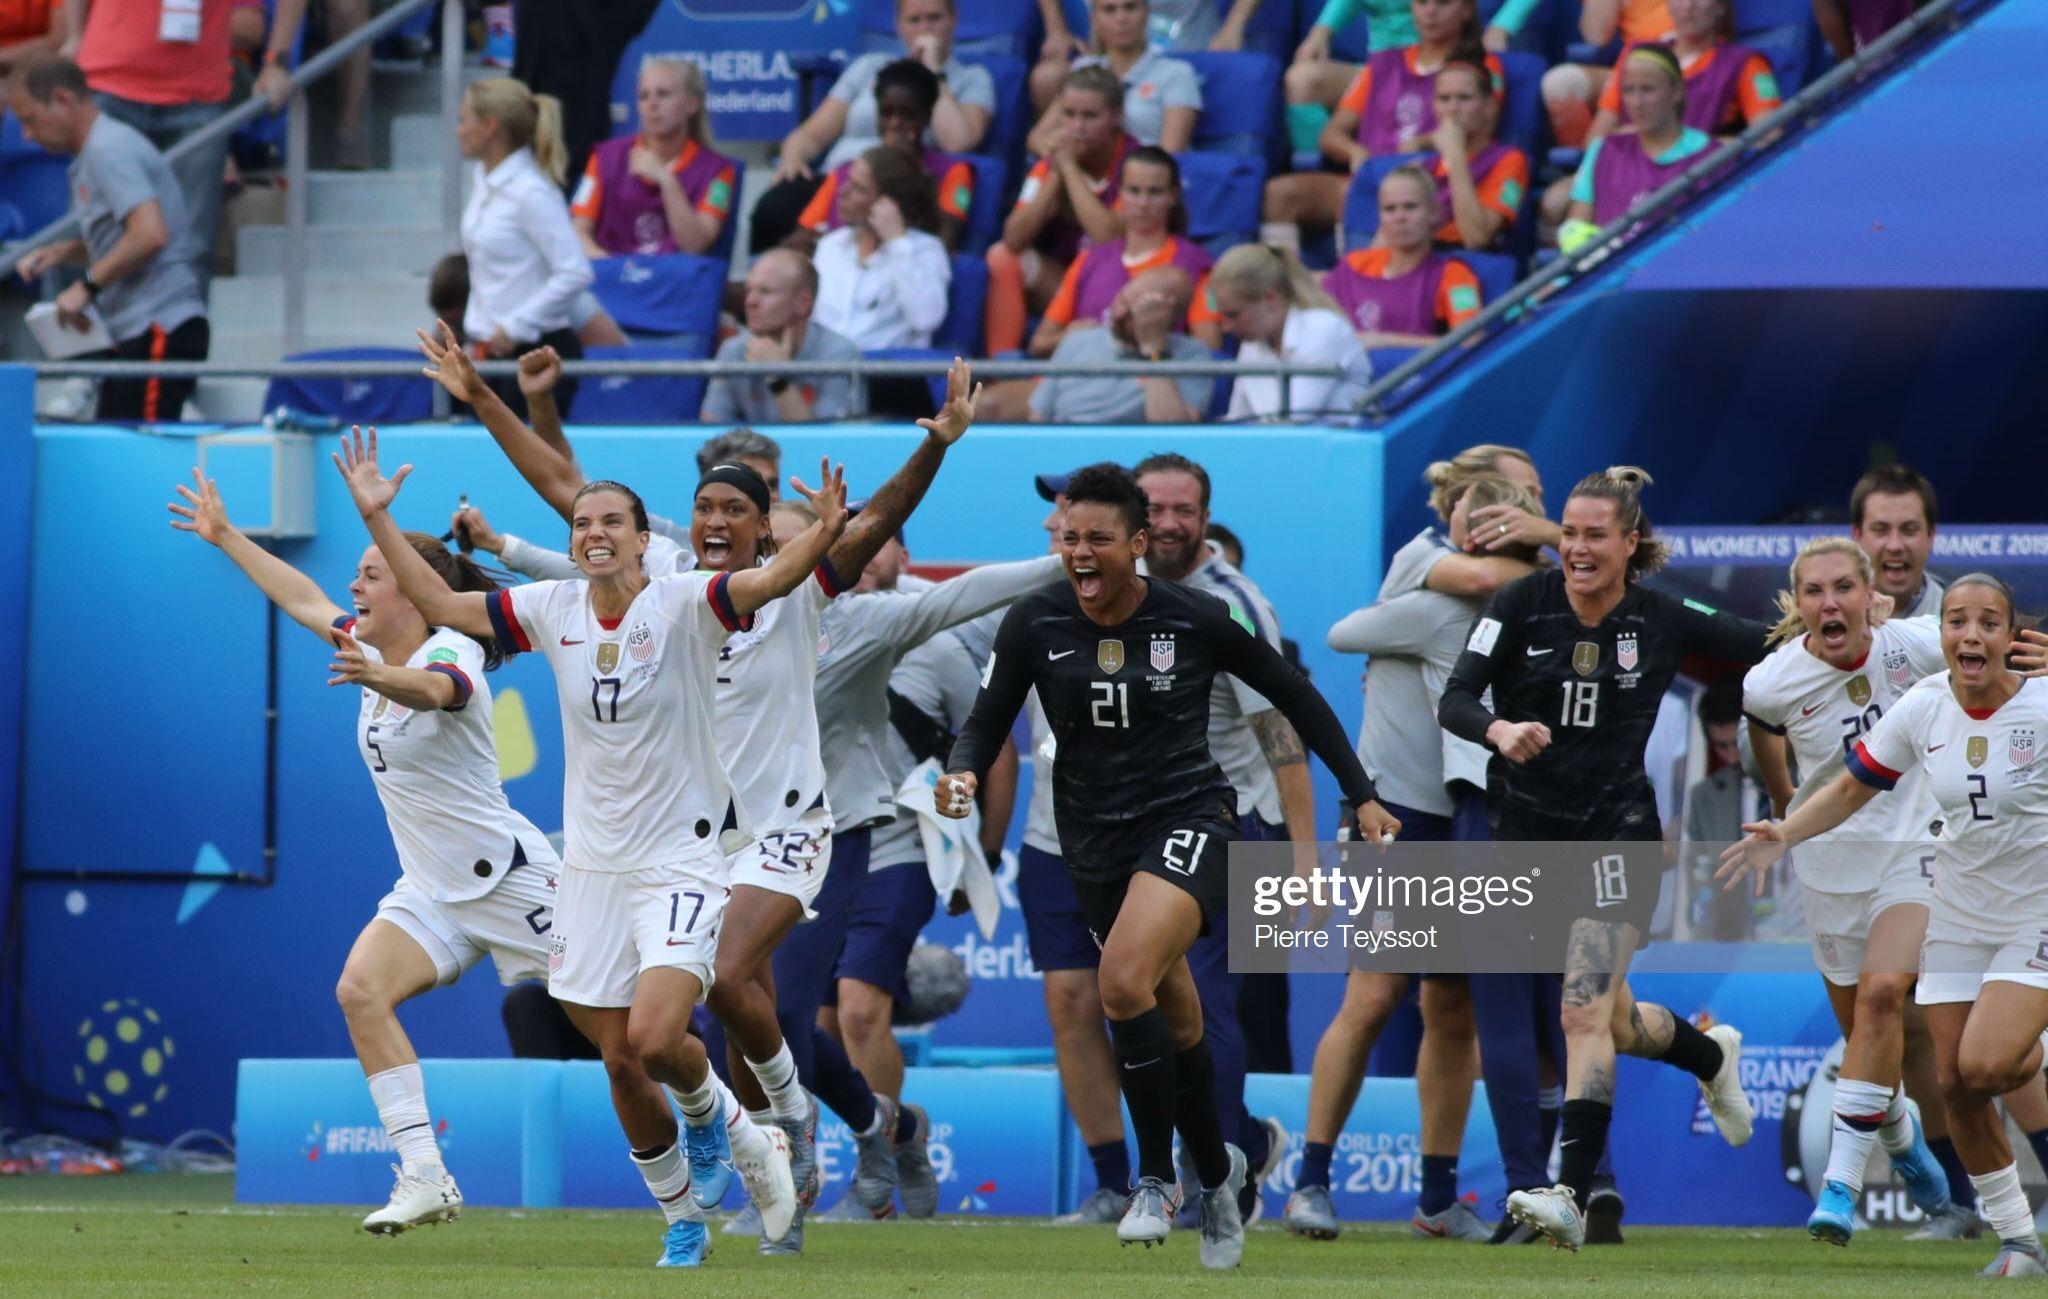 Uswnt World Cup Champions July 7 2019 World Cup Champions Champion Sports